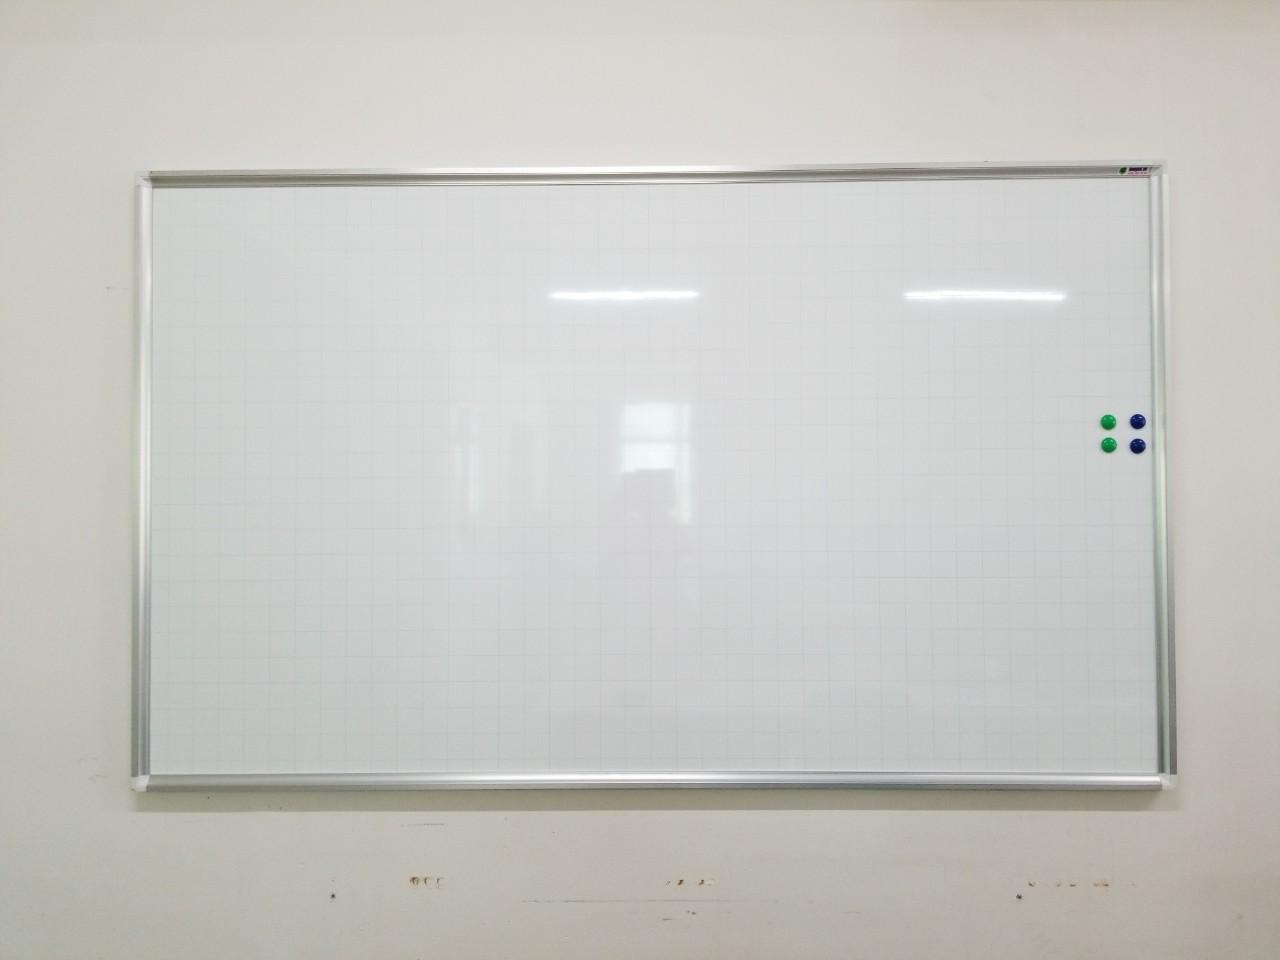 Mua bảng từ trắng